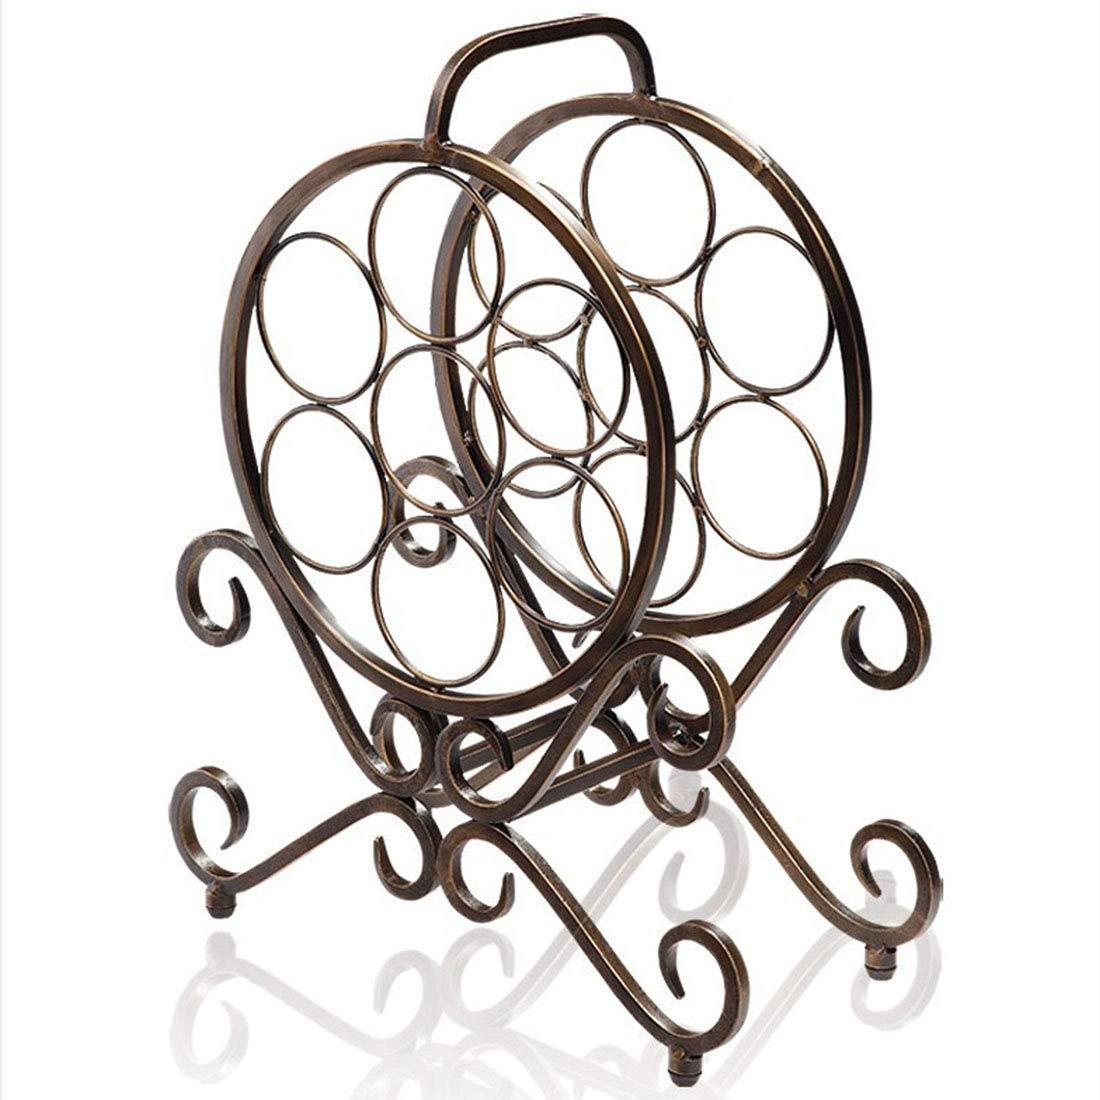 JPAKIOS ワインラッククリエイティブワインラックヴィンテージアイアンオーナメントファッションシンプルなワインボトルラック (色 : Copper) B07R5FDP8X Copper